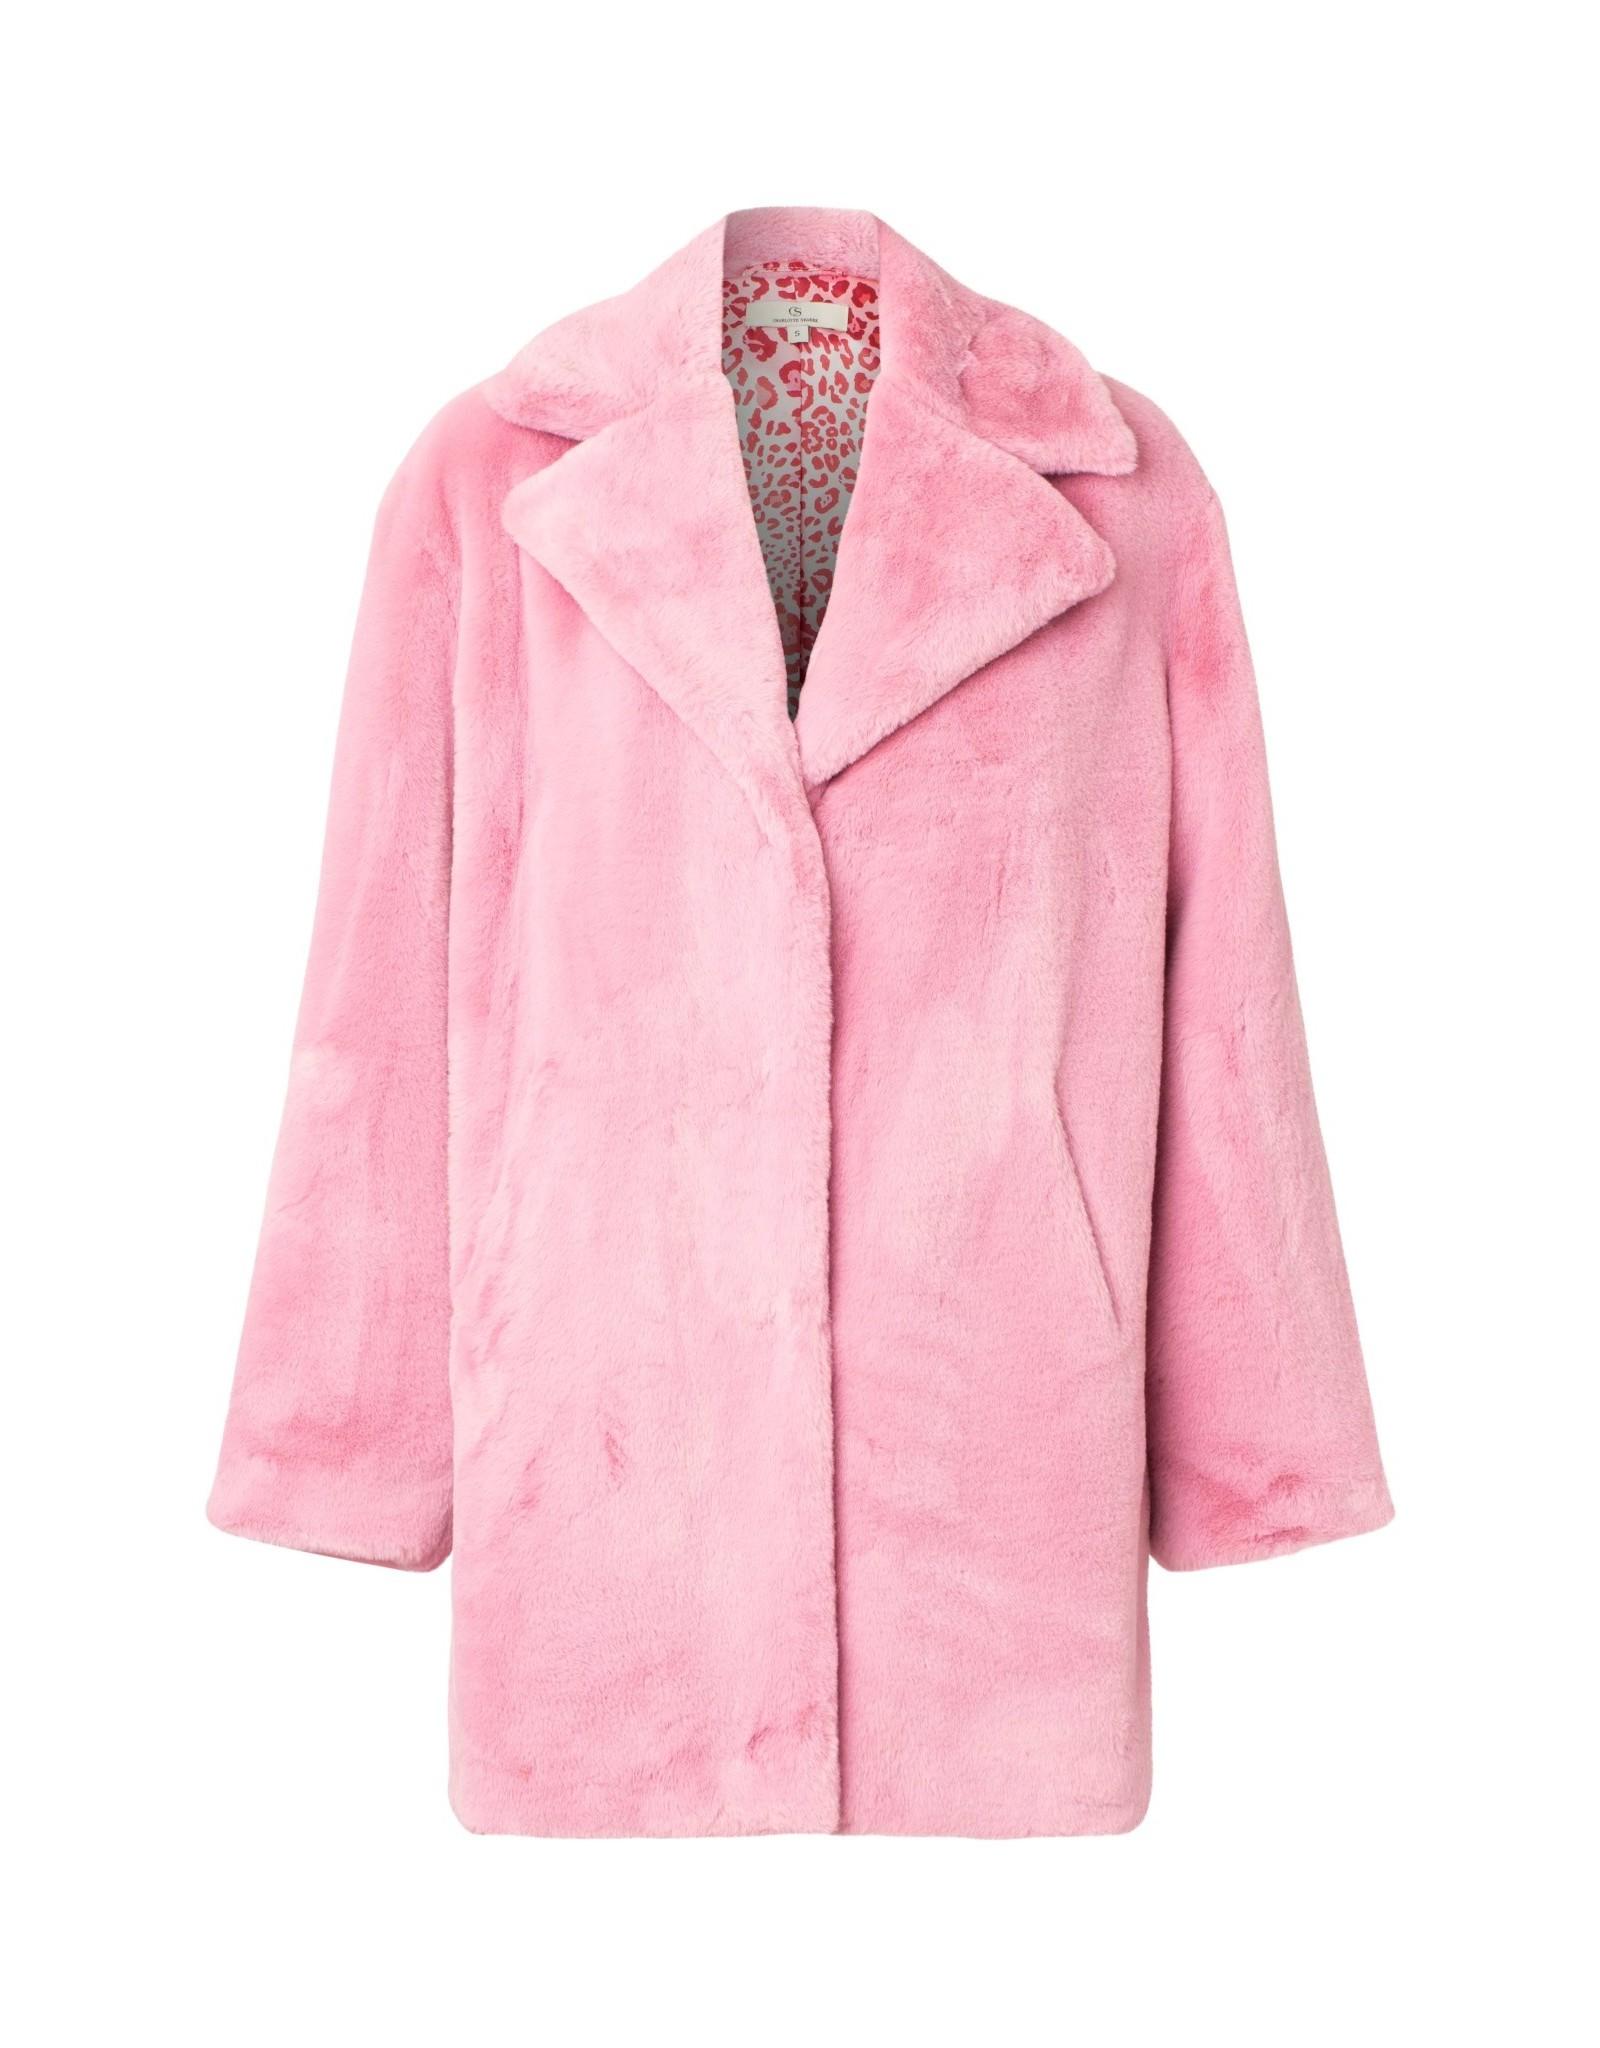 Charlotte Sparre Faux Fur Coat Pink